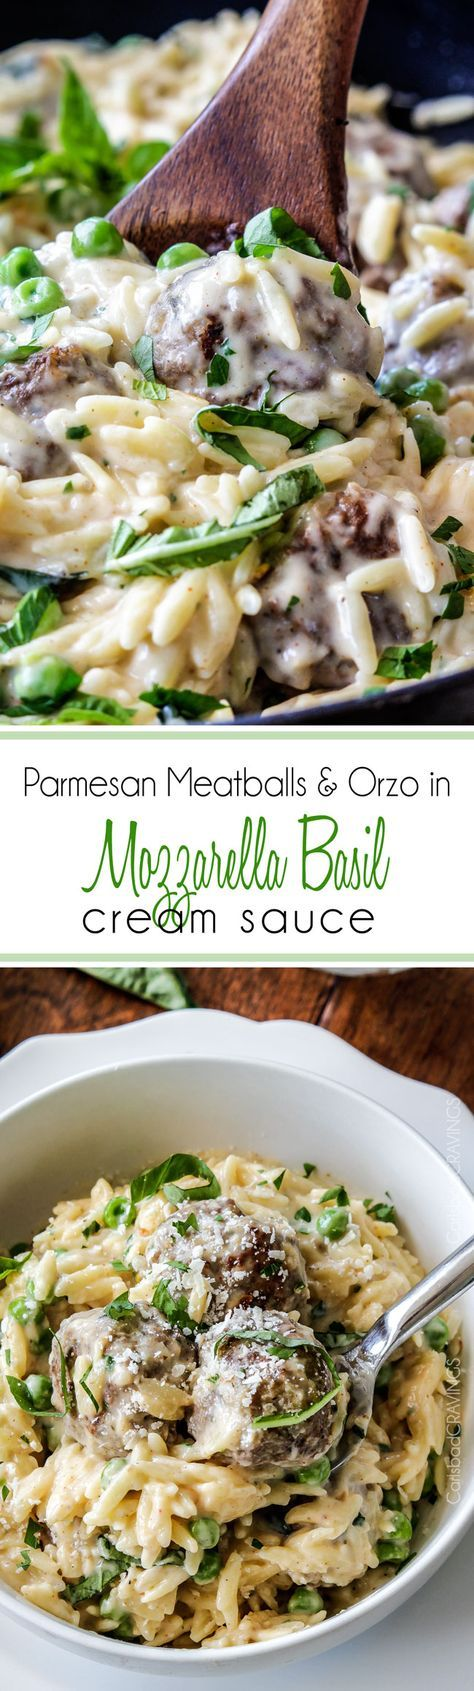 how to make good meatballs and sauce